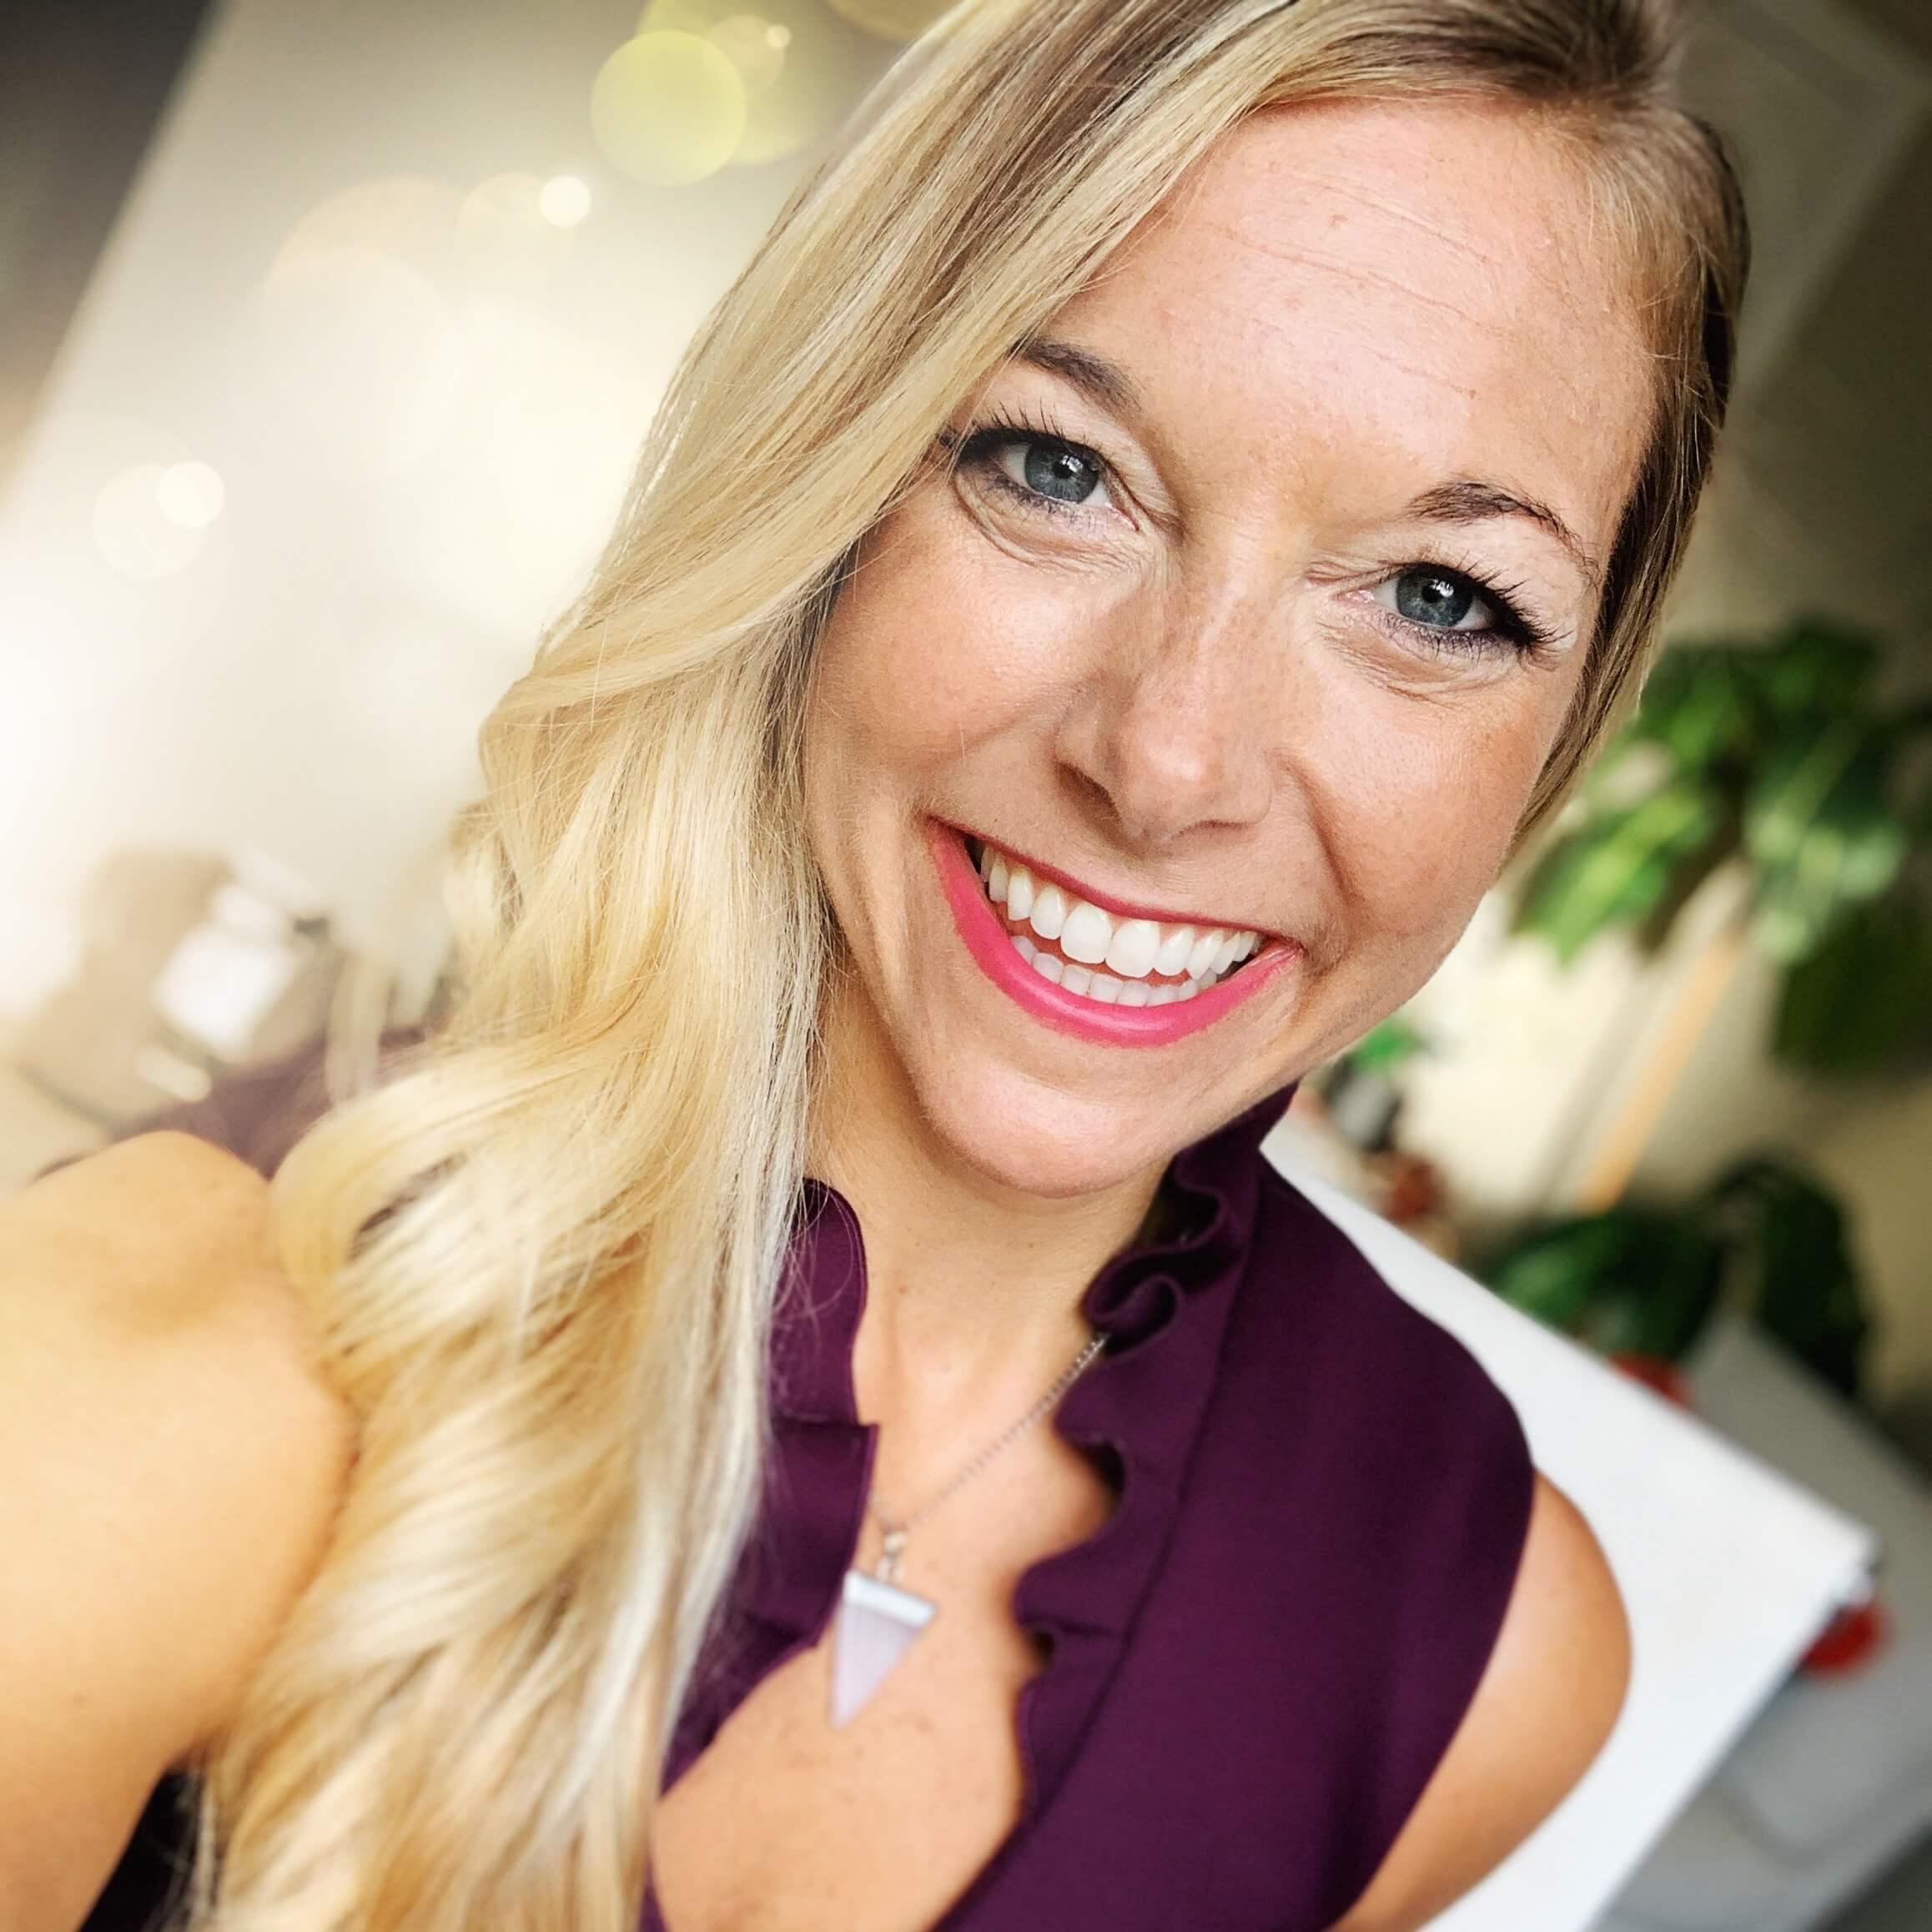 Beautiful Blonde Smiling